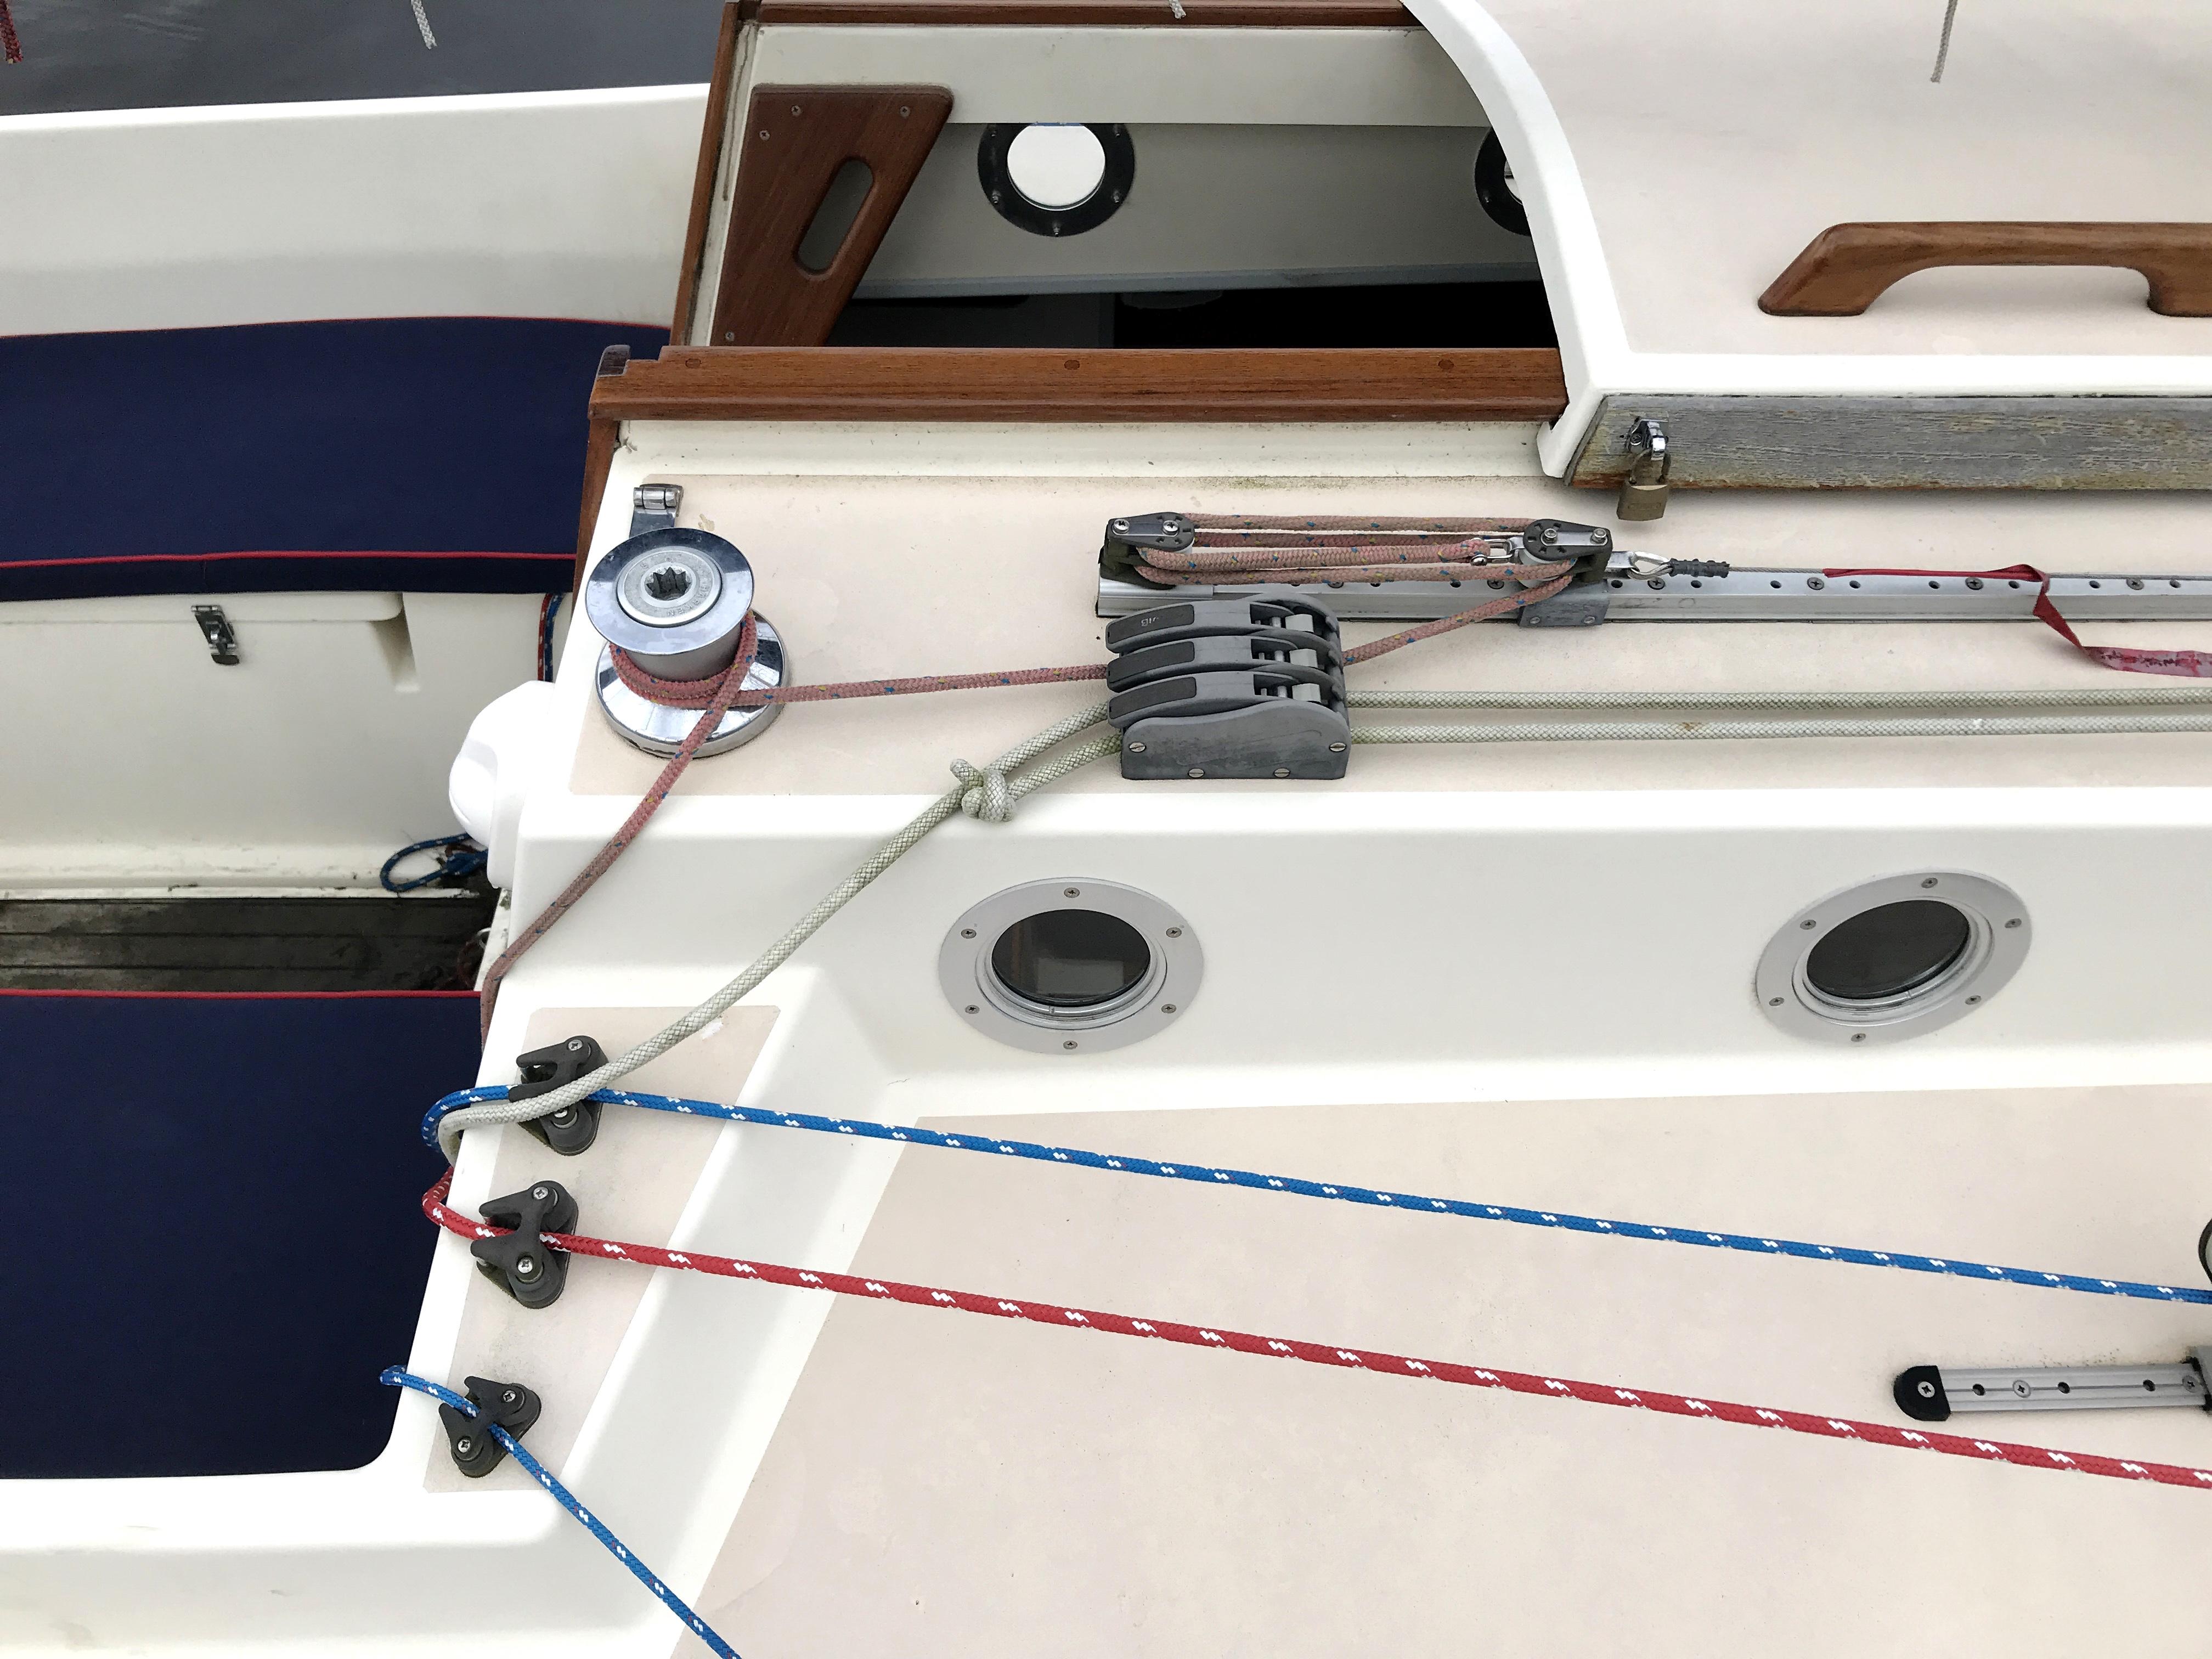 Cornish Crabbers Crabber 22 - amidship deck lines